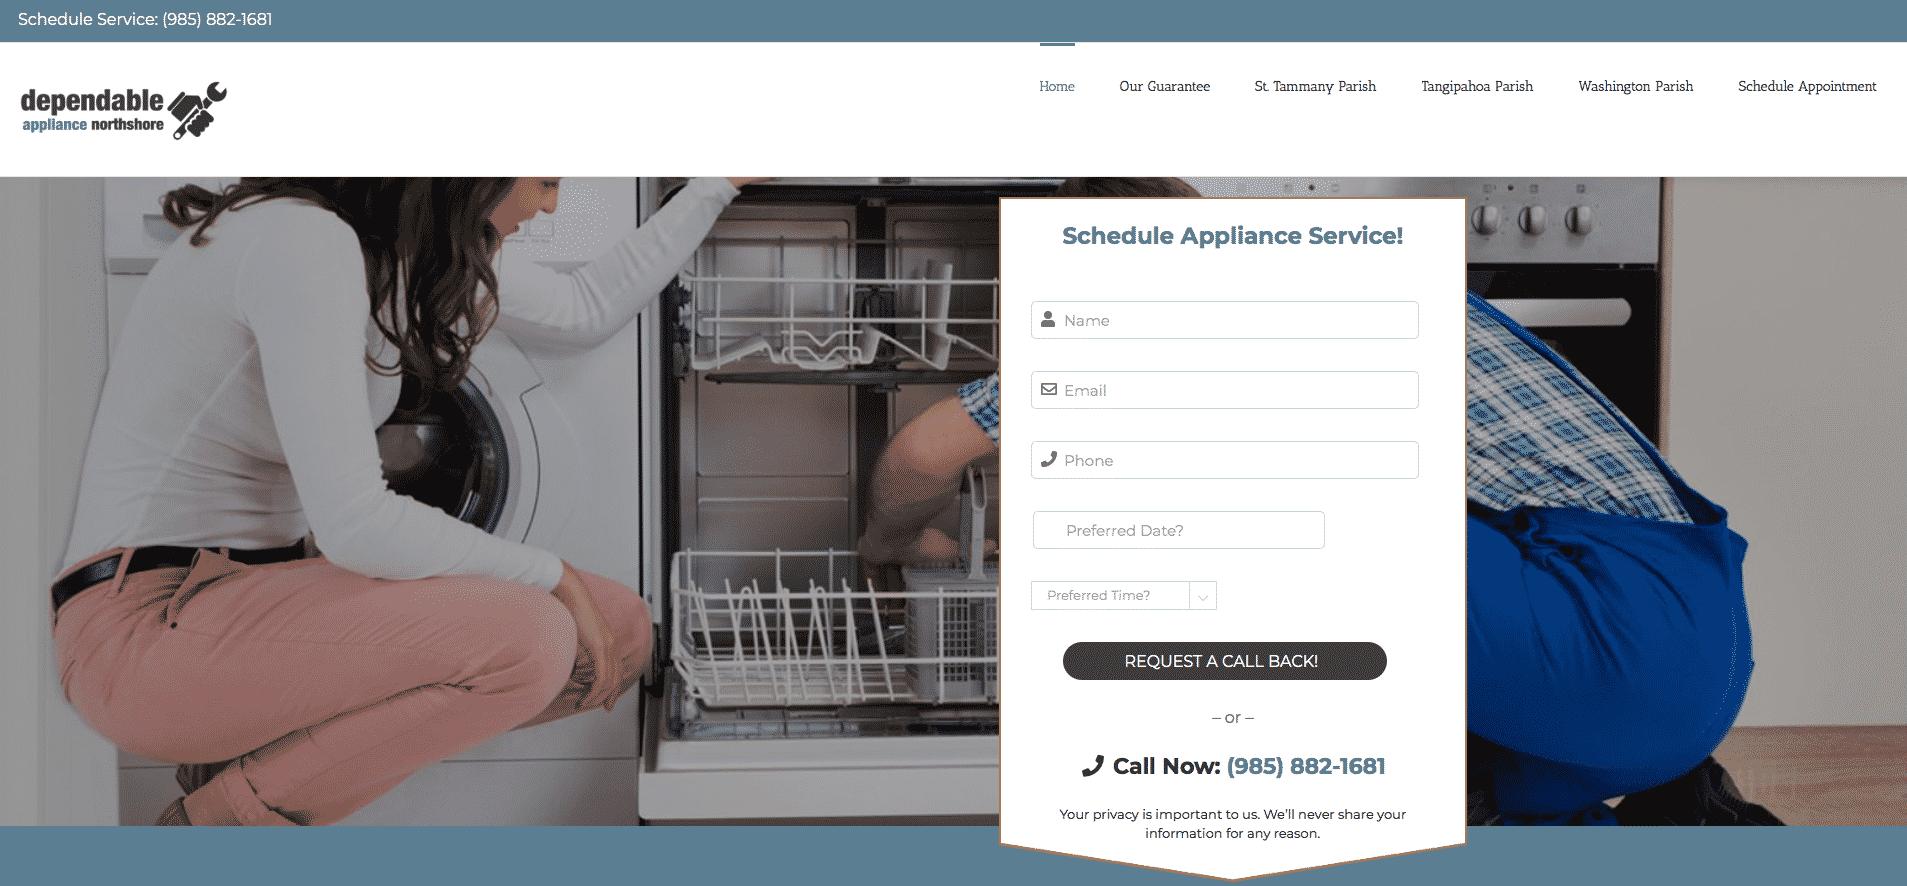 Dependable Appliance Northshore